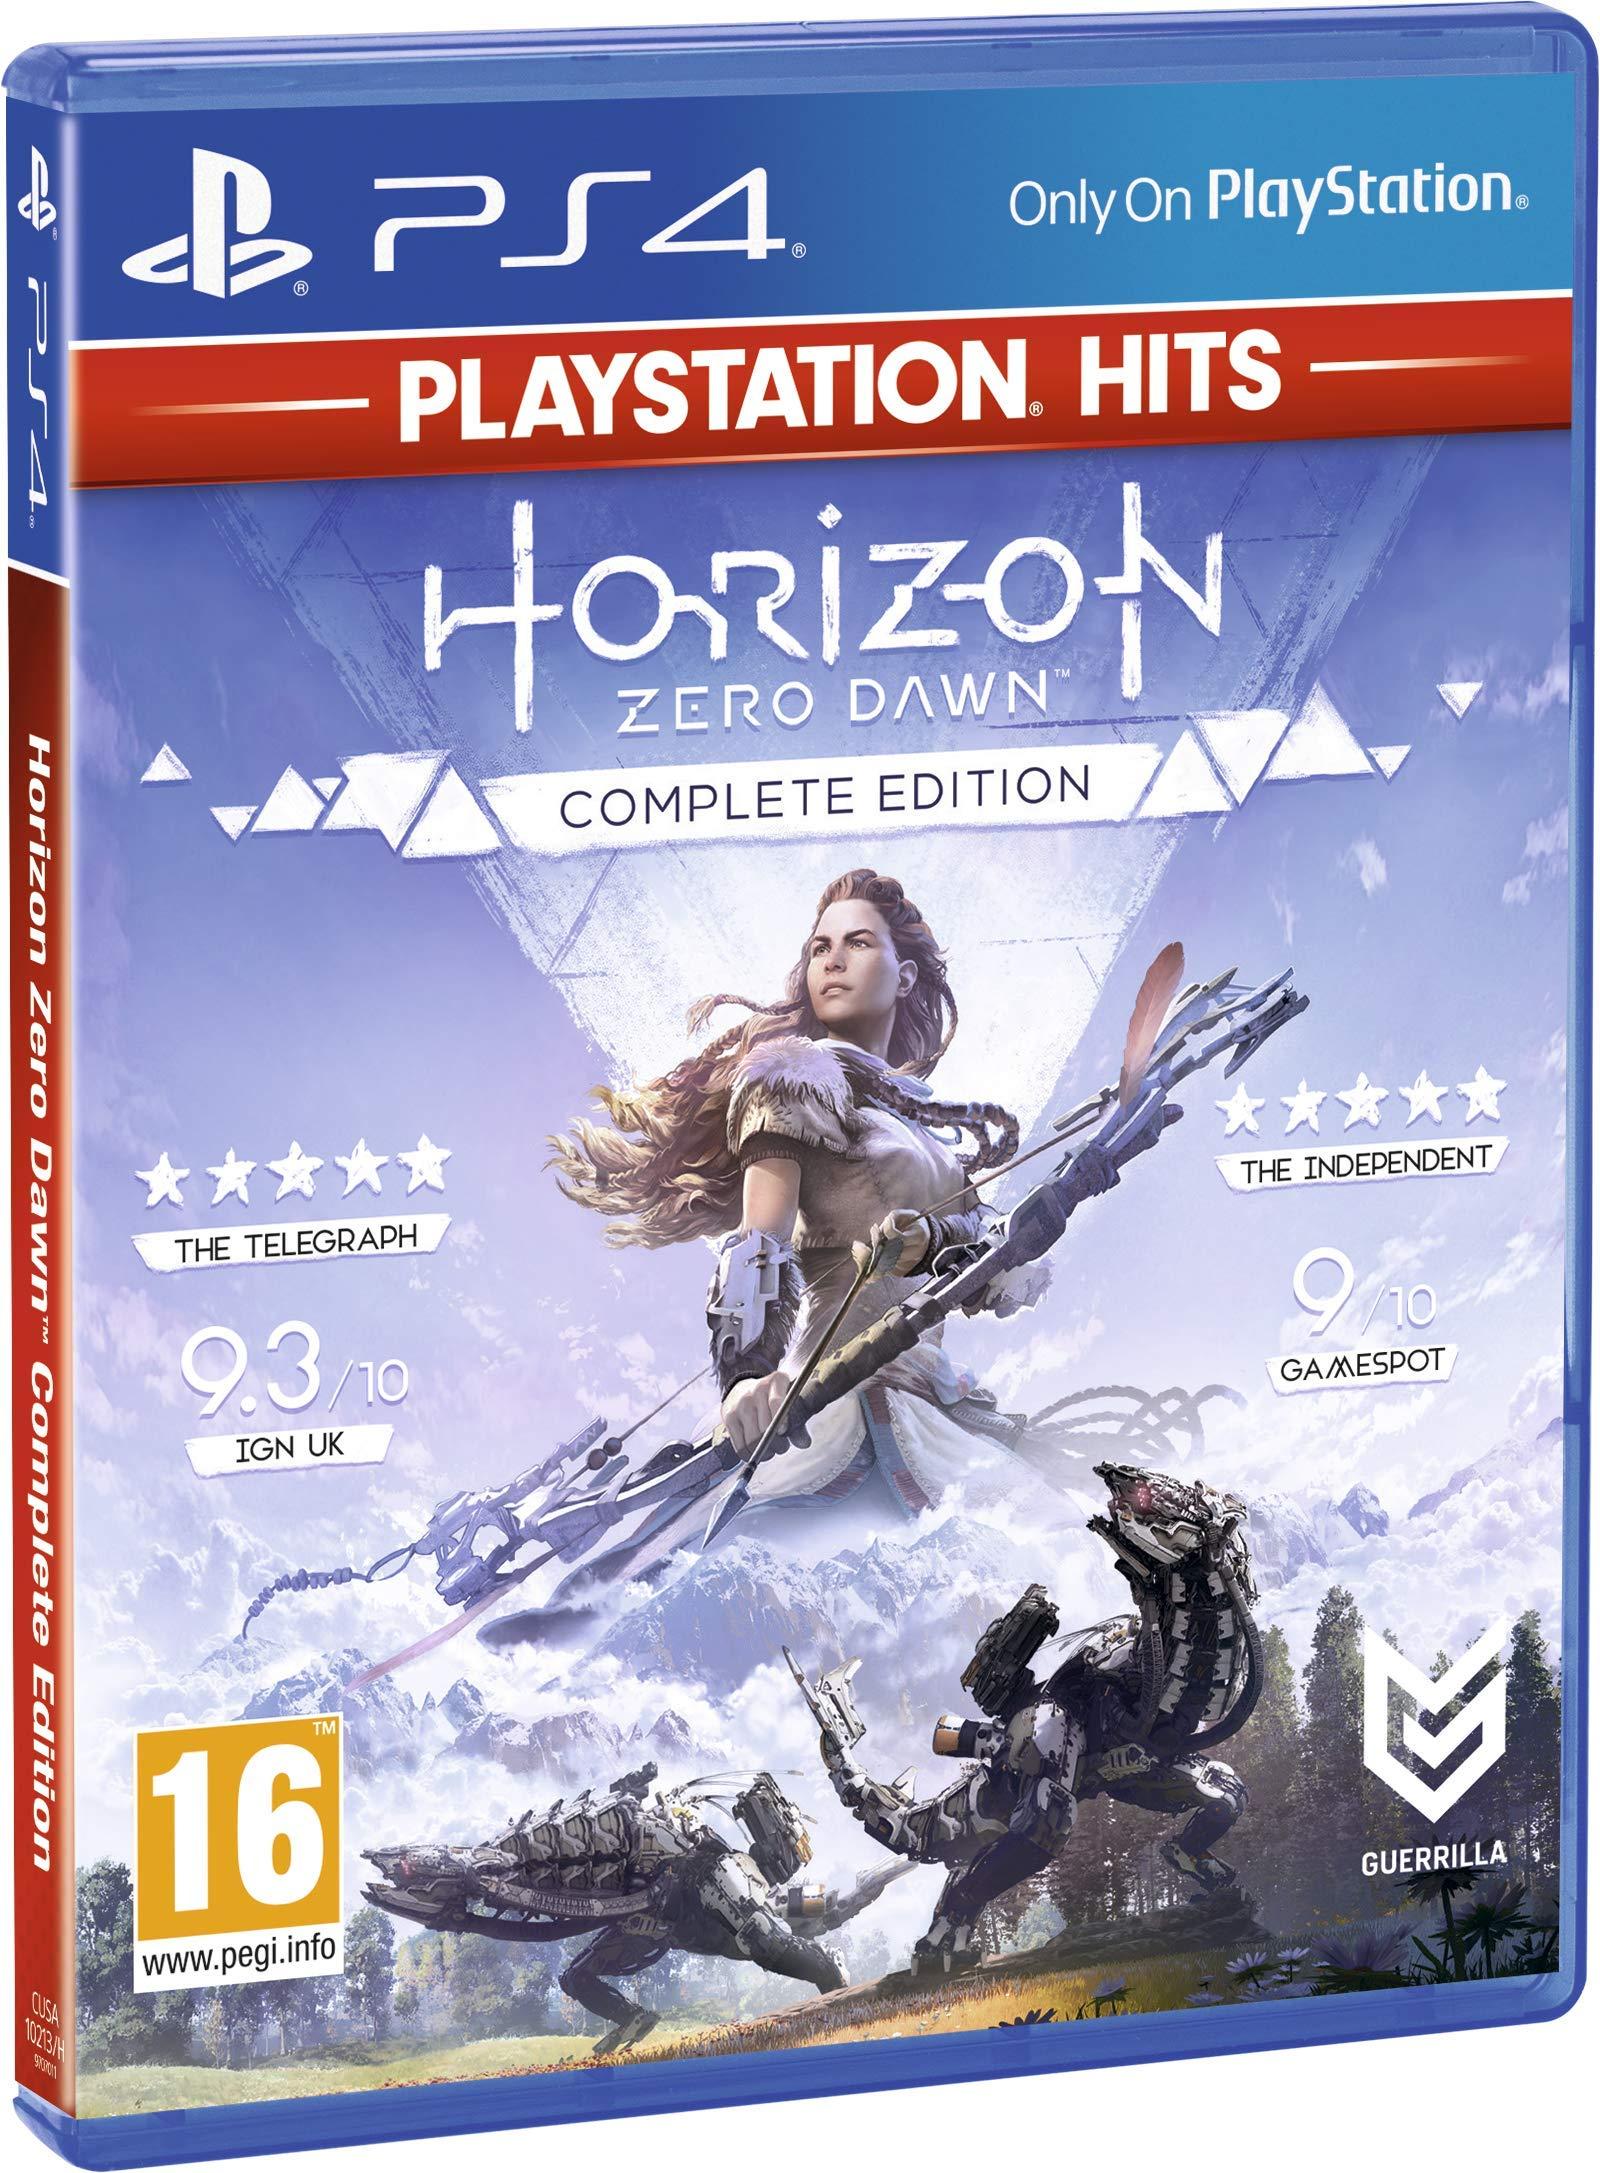 Horizon: Zero Dawn – Complete Edition (Playstation Hits) (Nordic)